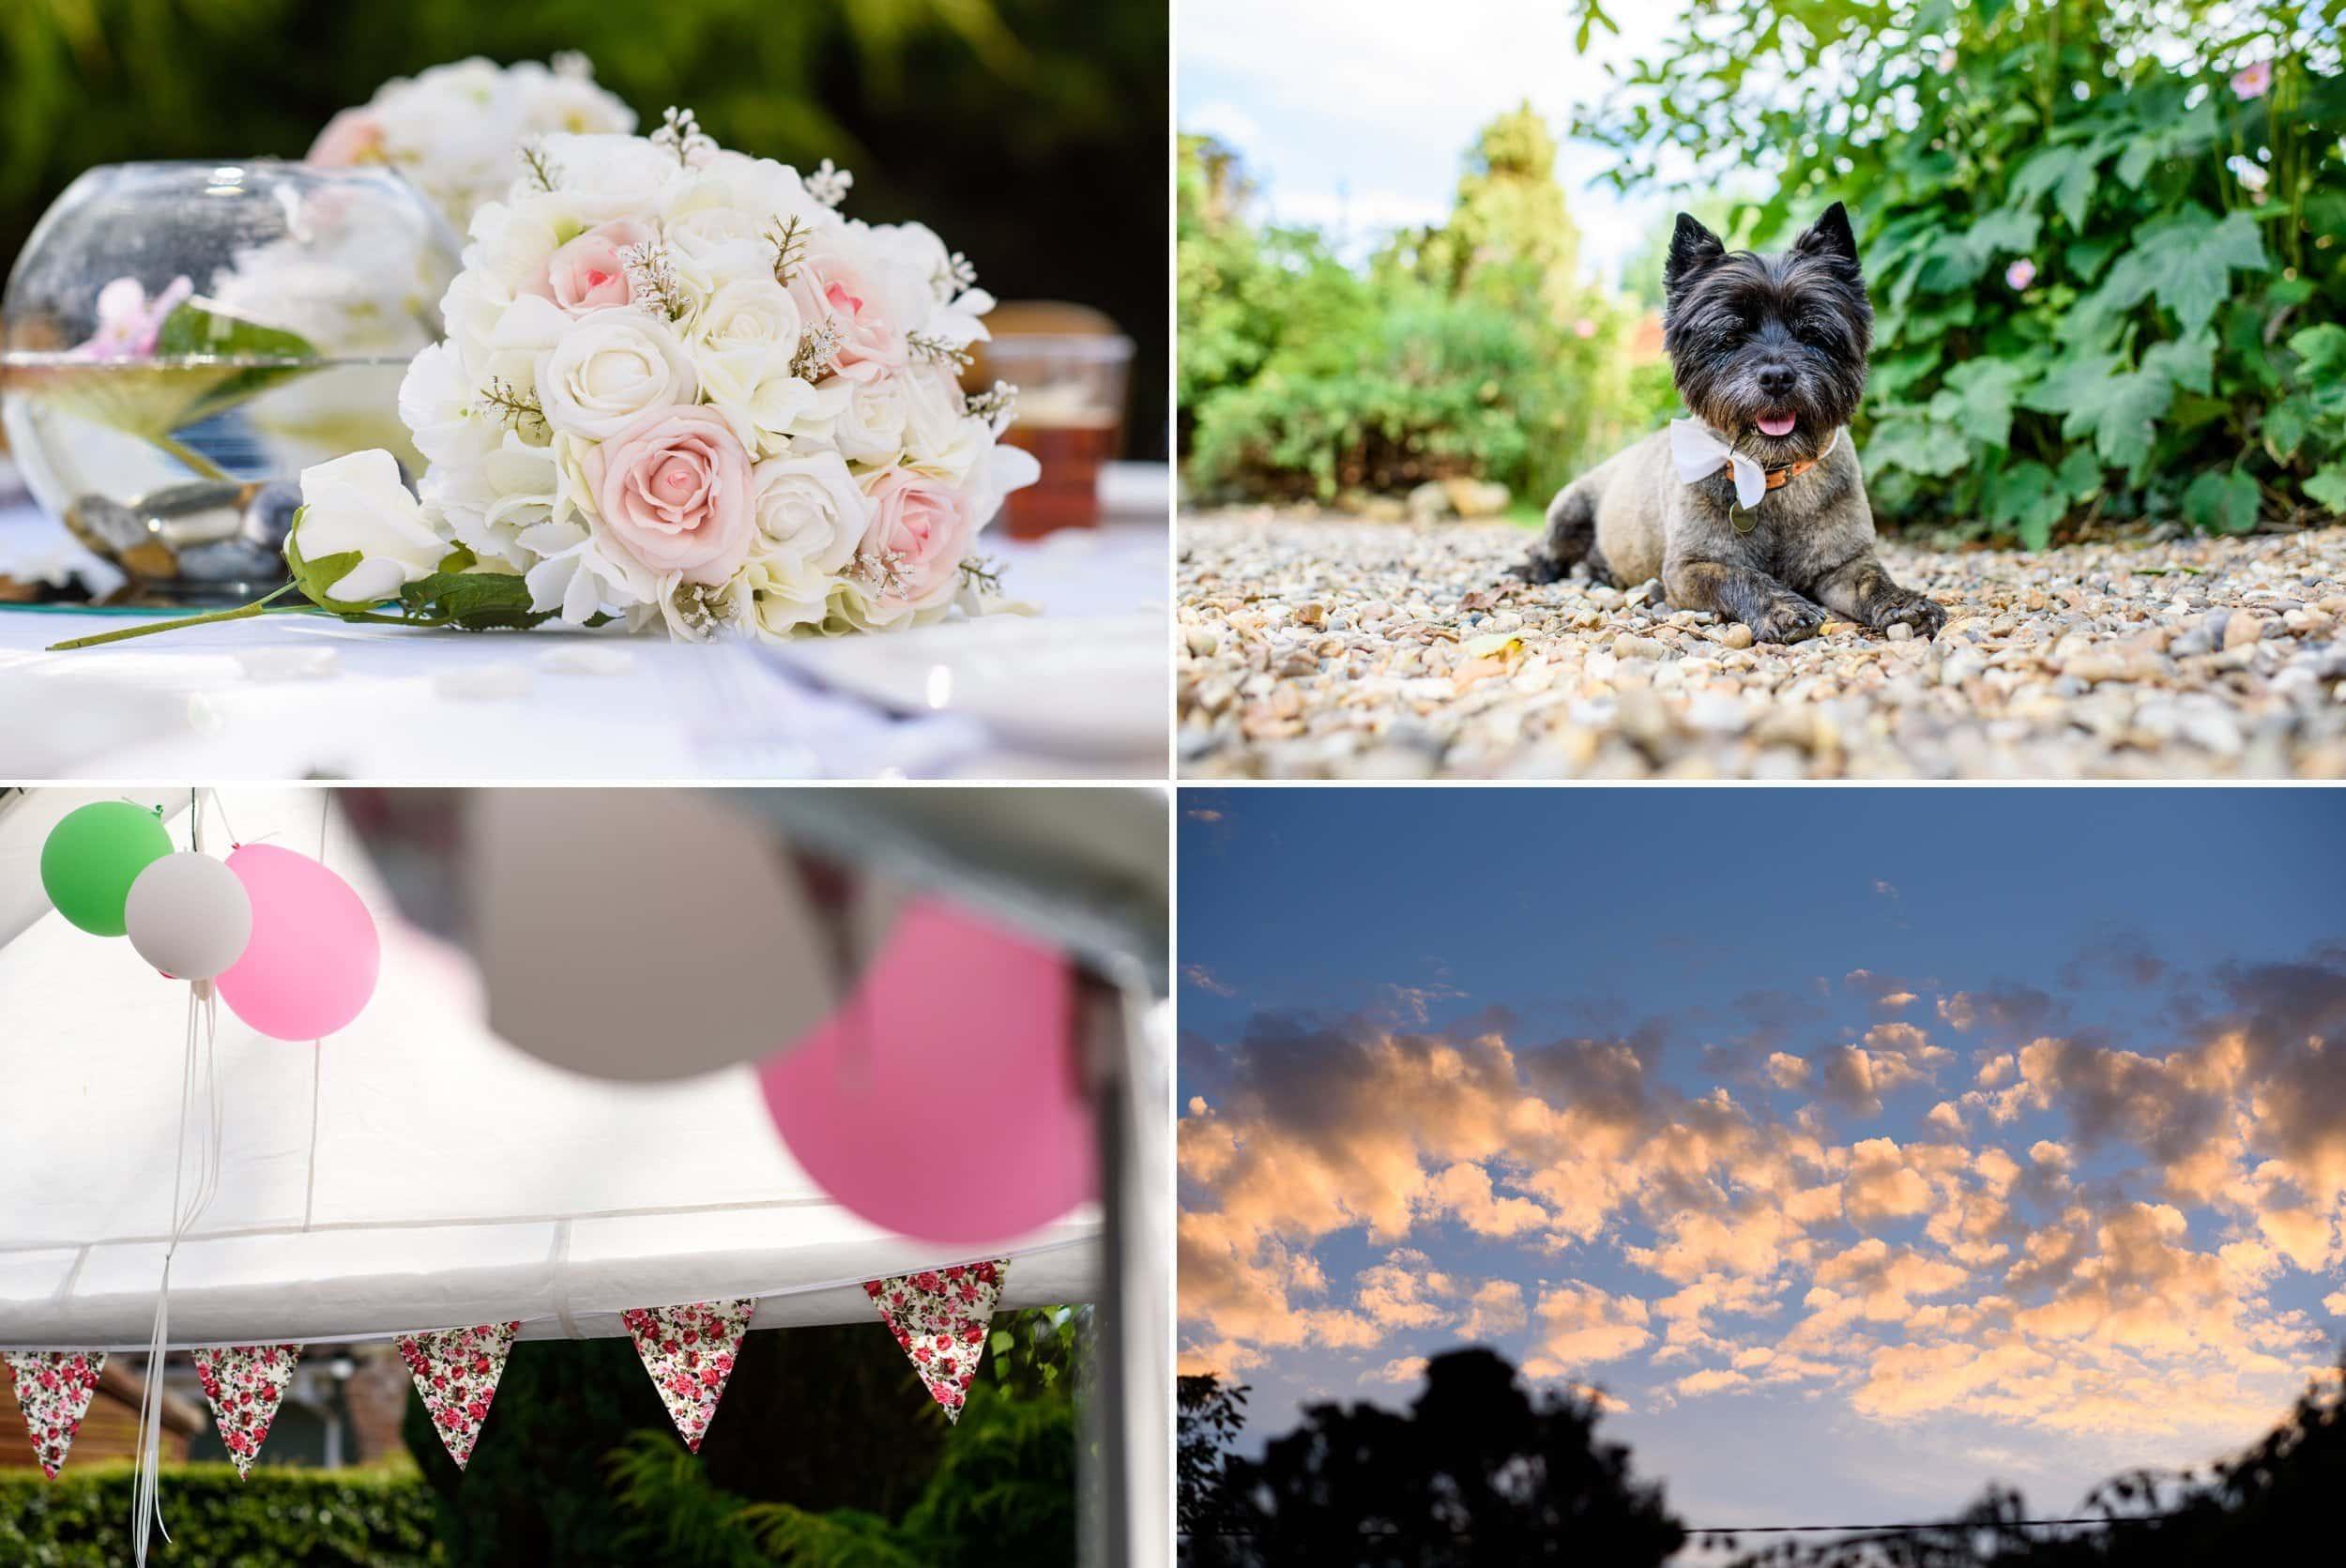 cley_windmill_norfolk_wedding_photography-14